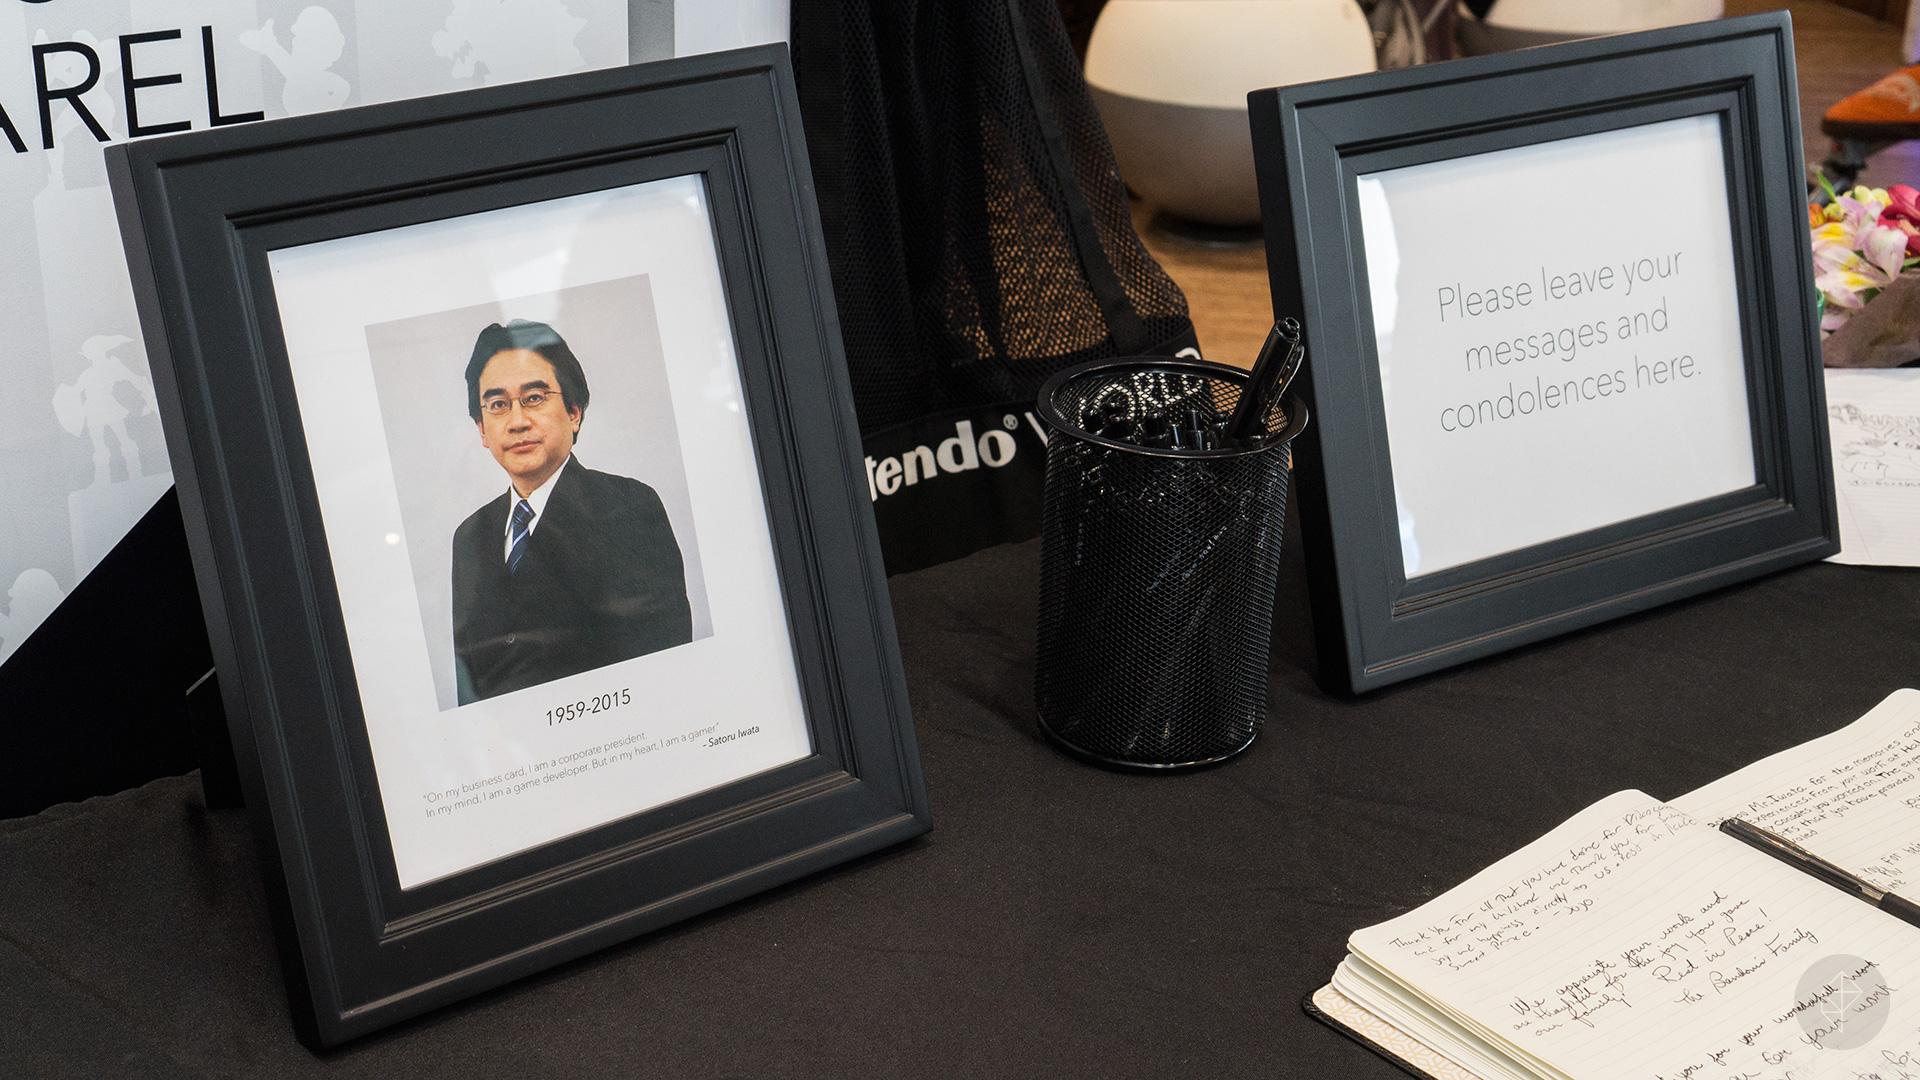 A visit to the Satoru Iwata memorial at New York's Nintendo World Store